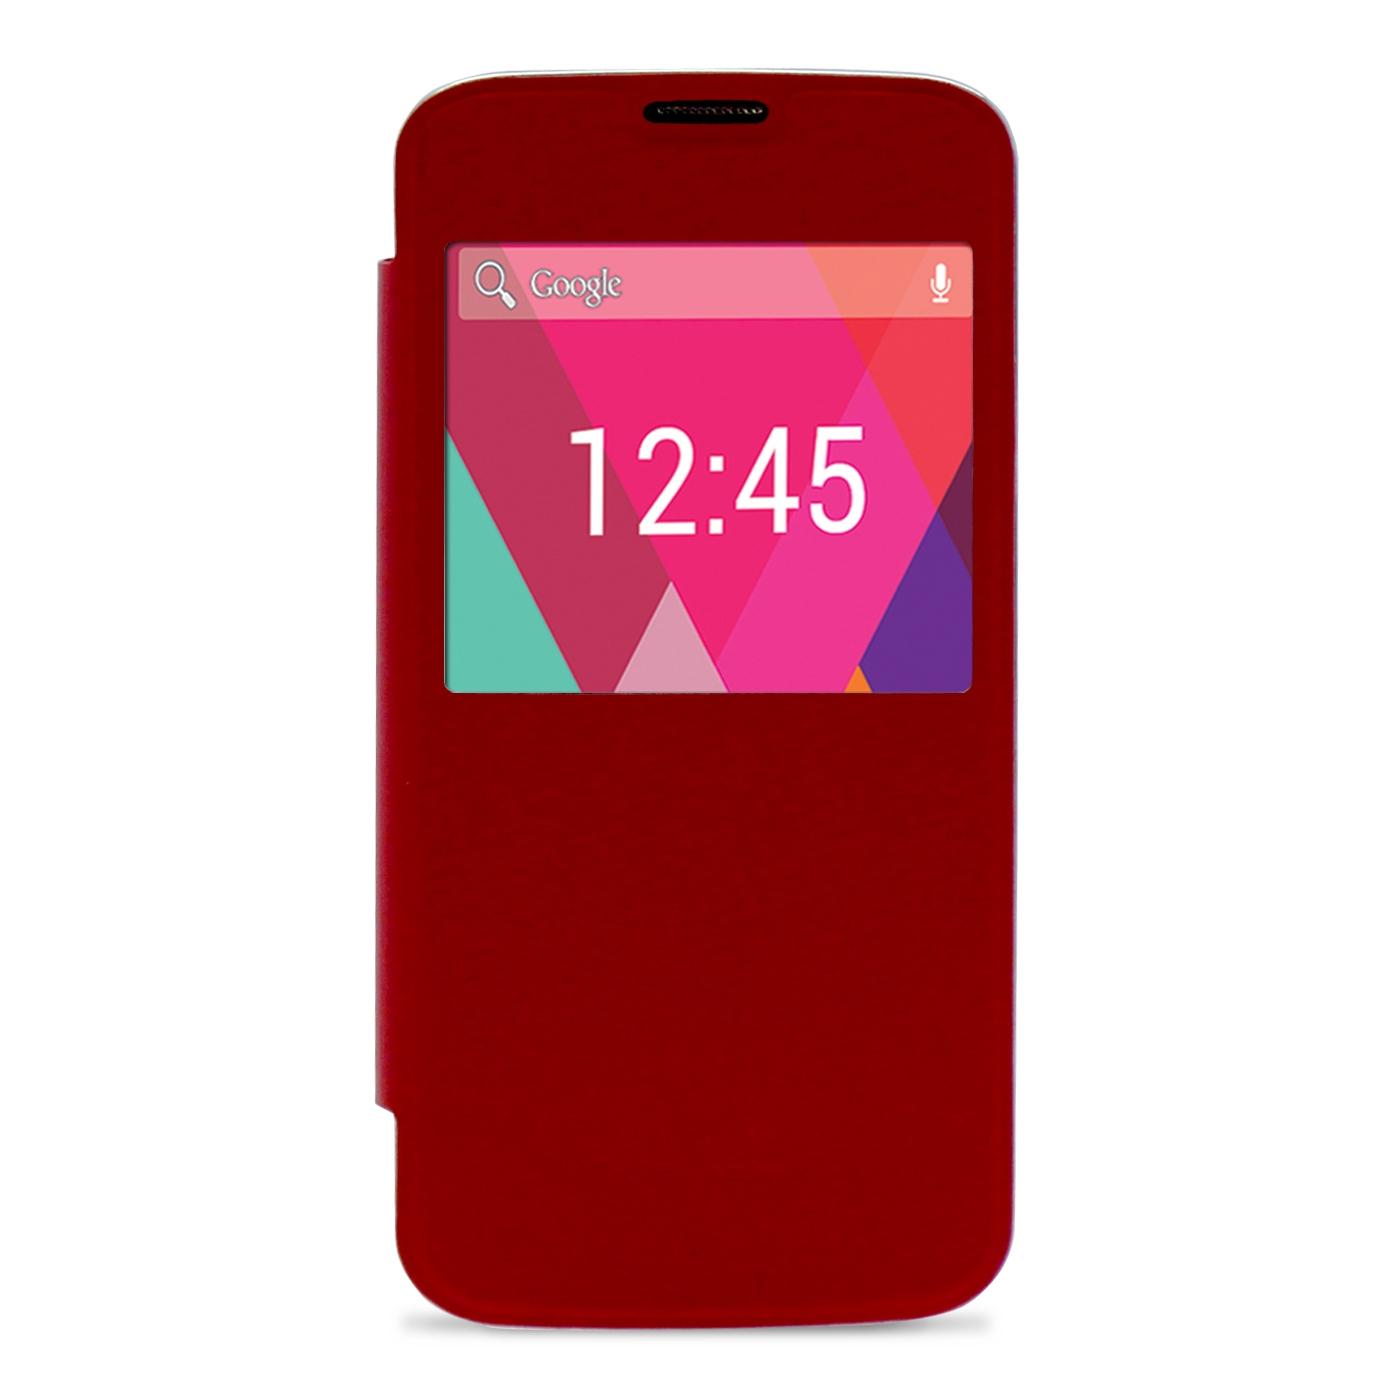 Funda-slim-cover-case-phoenix-para-telefono-smartphone-phrockx1-5-034-rojo